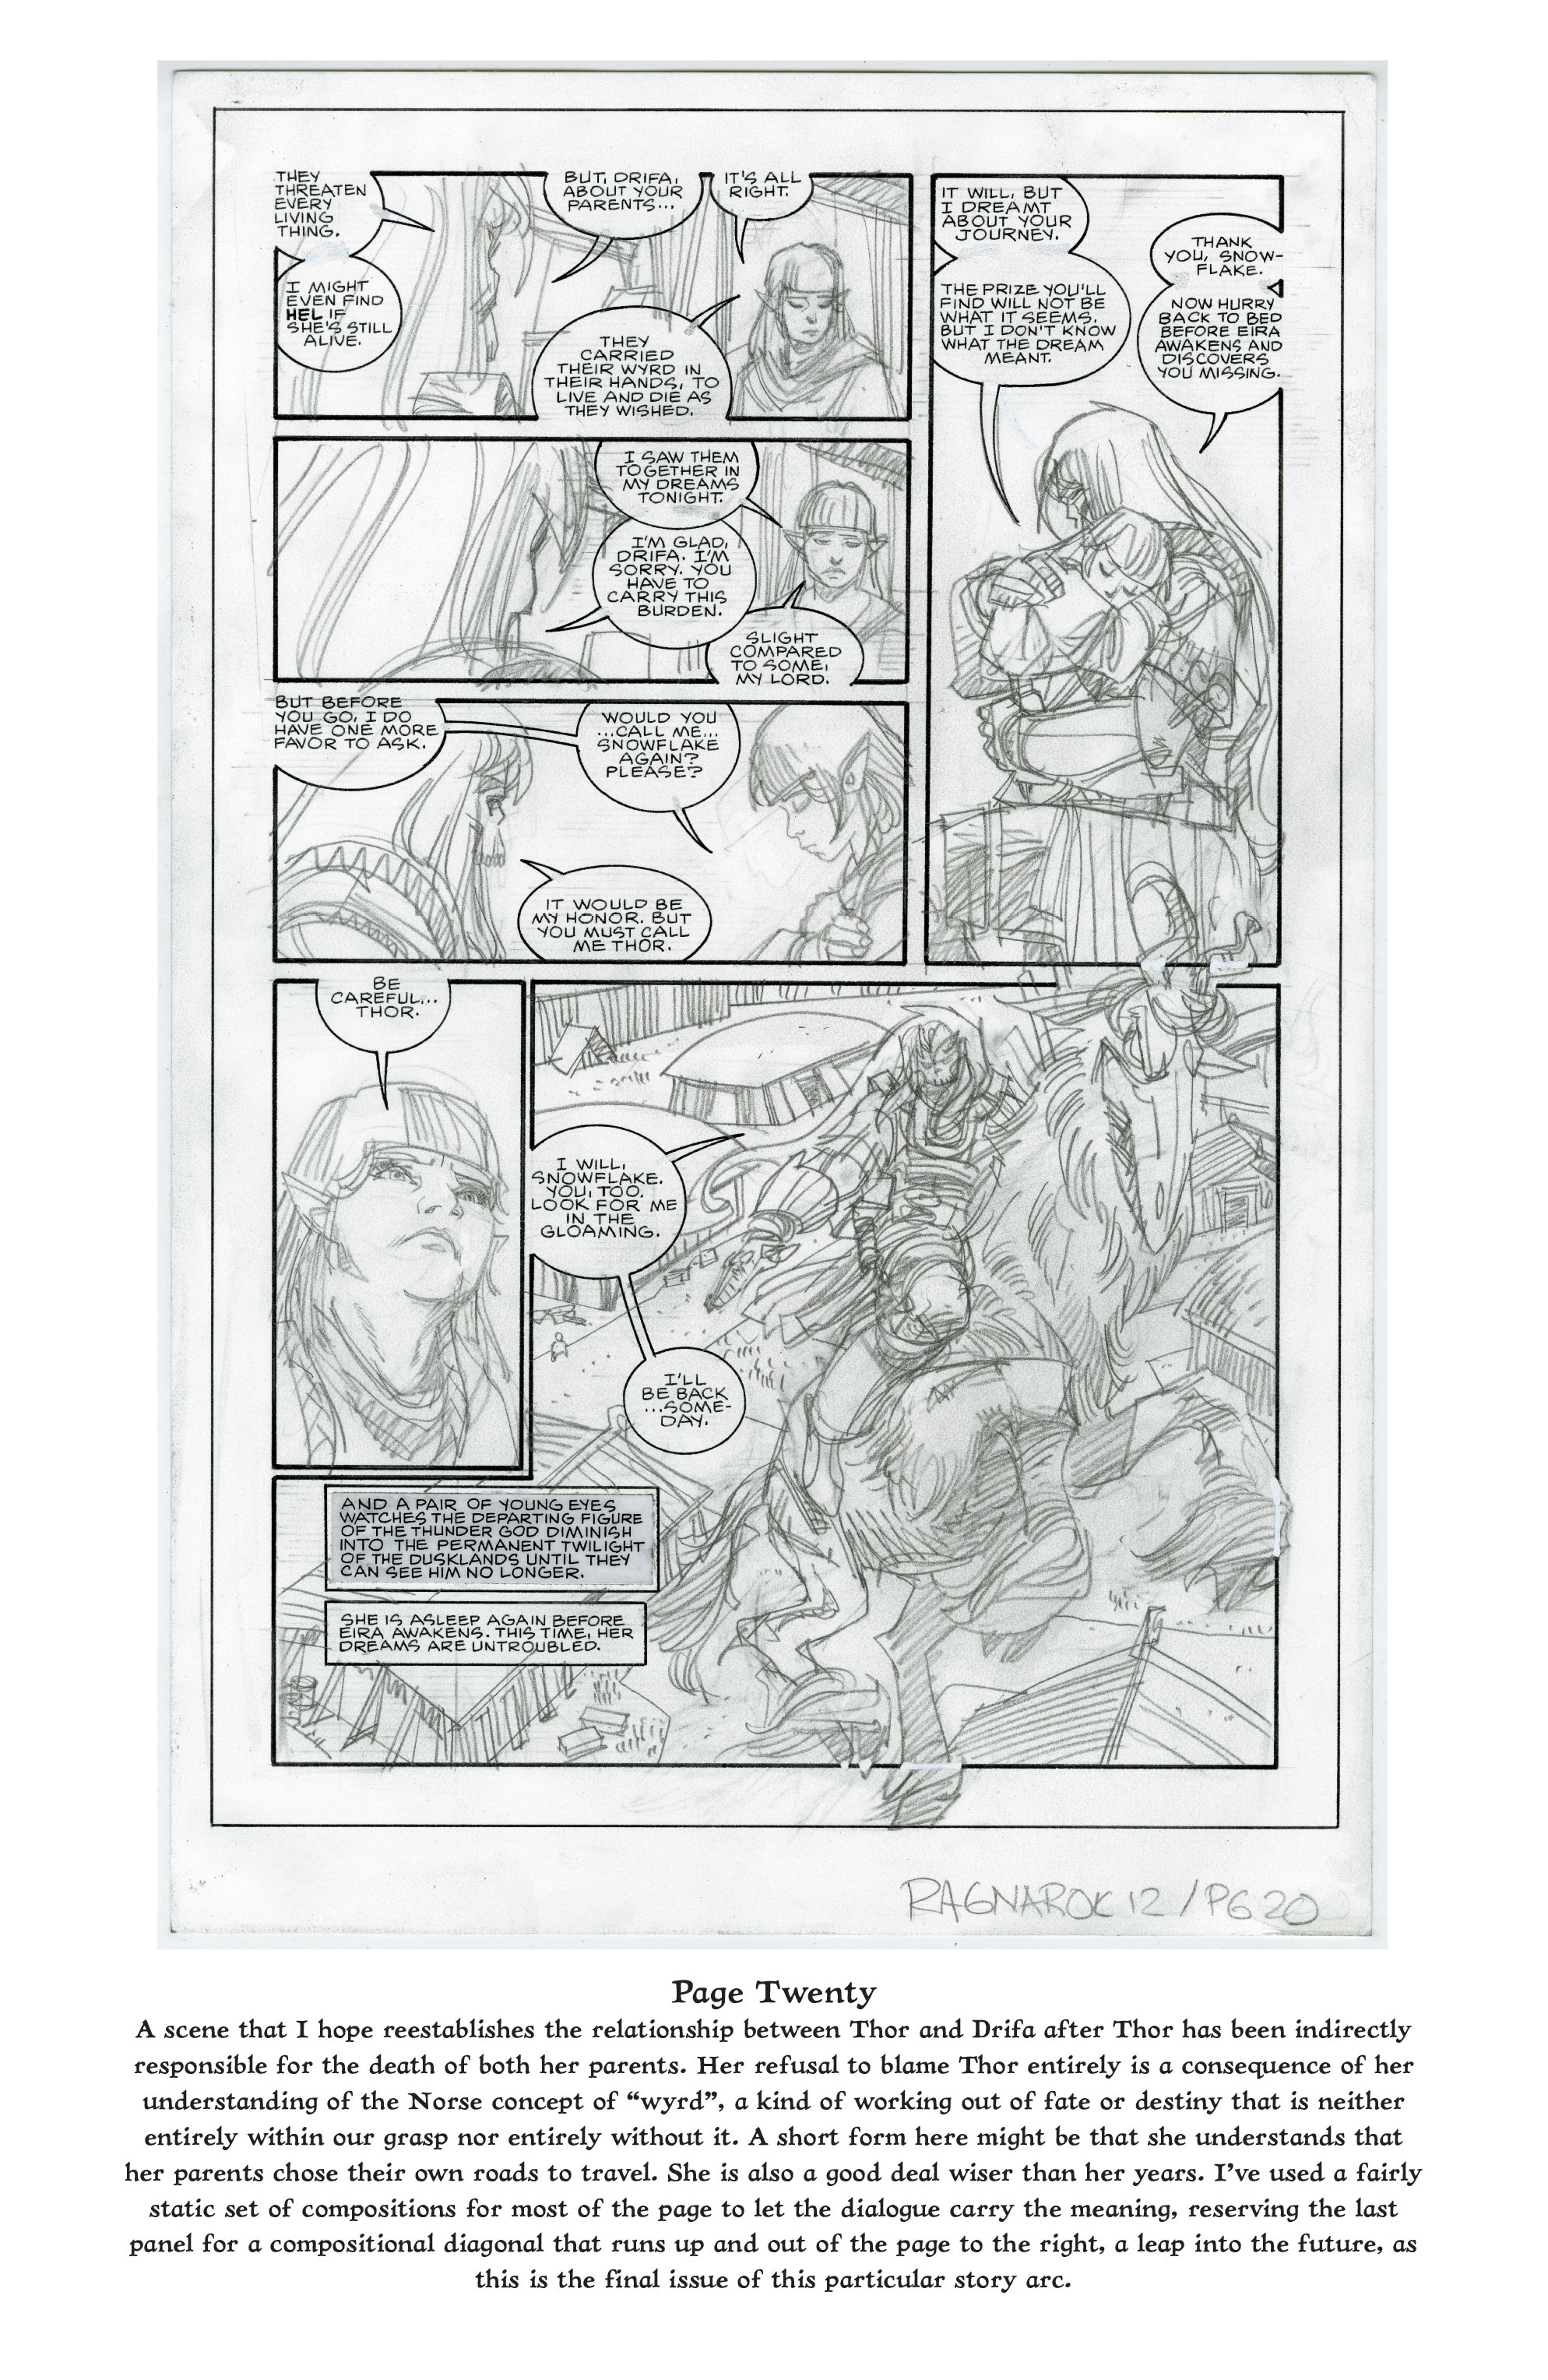 Read online Ragnarok comic -  Issue #12 - 30